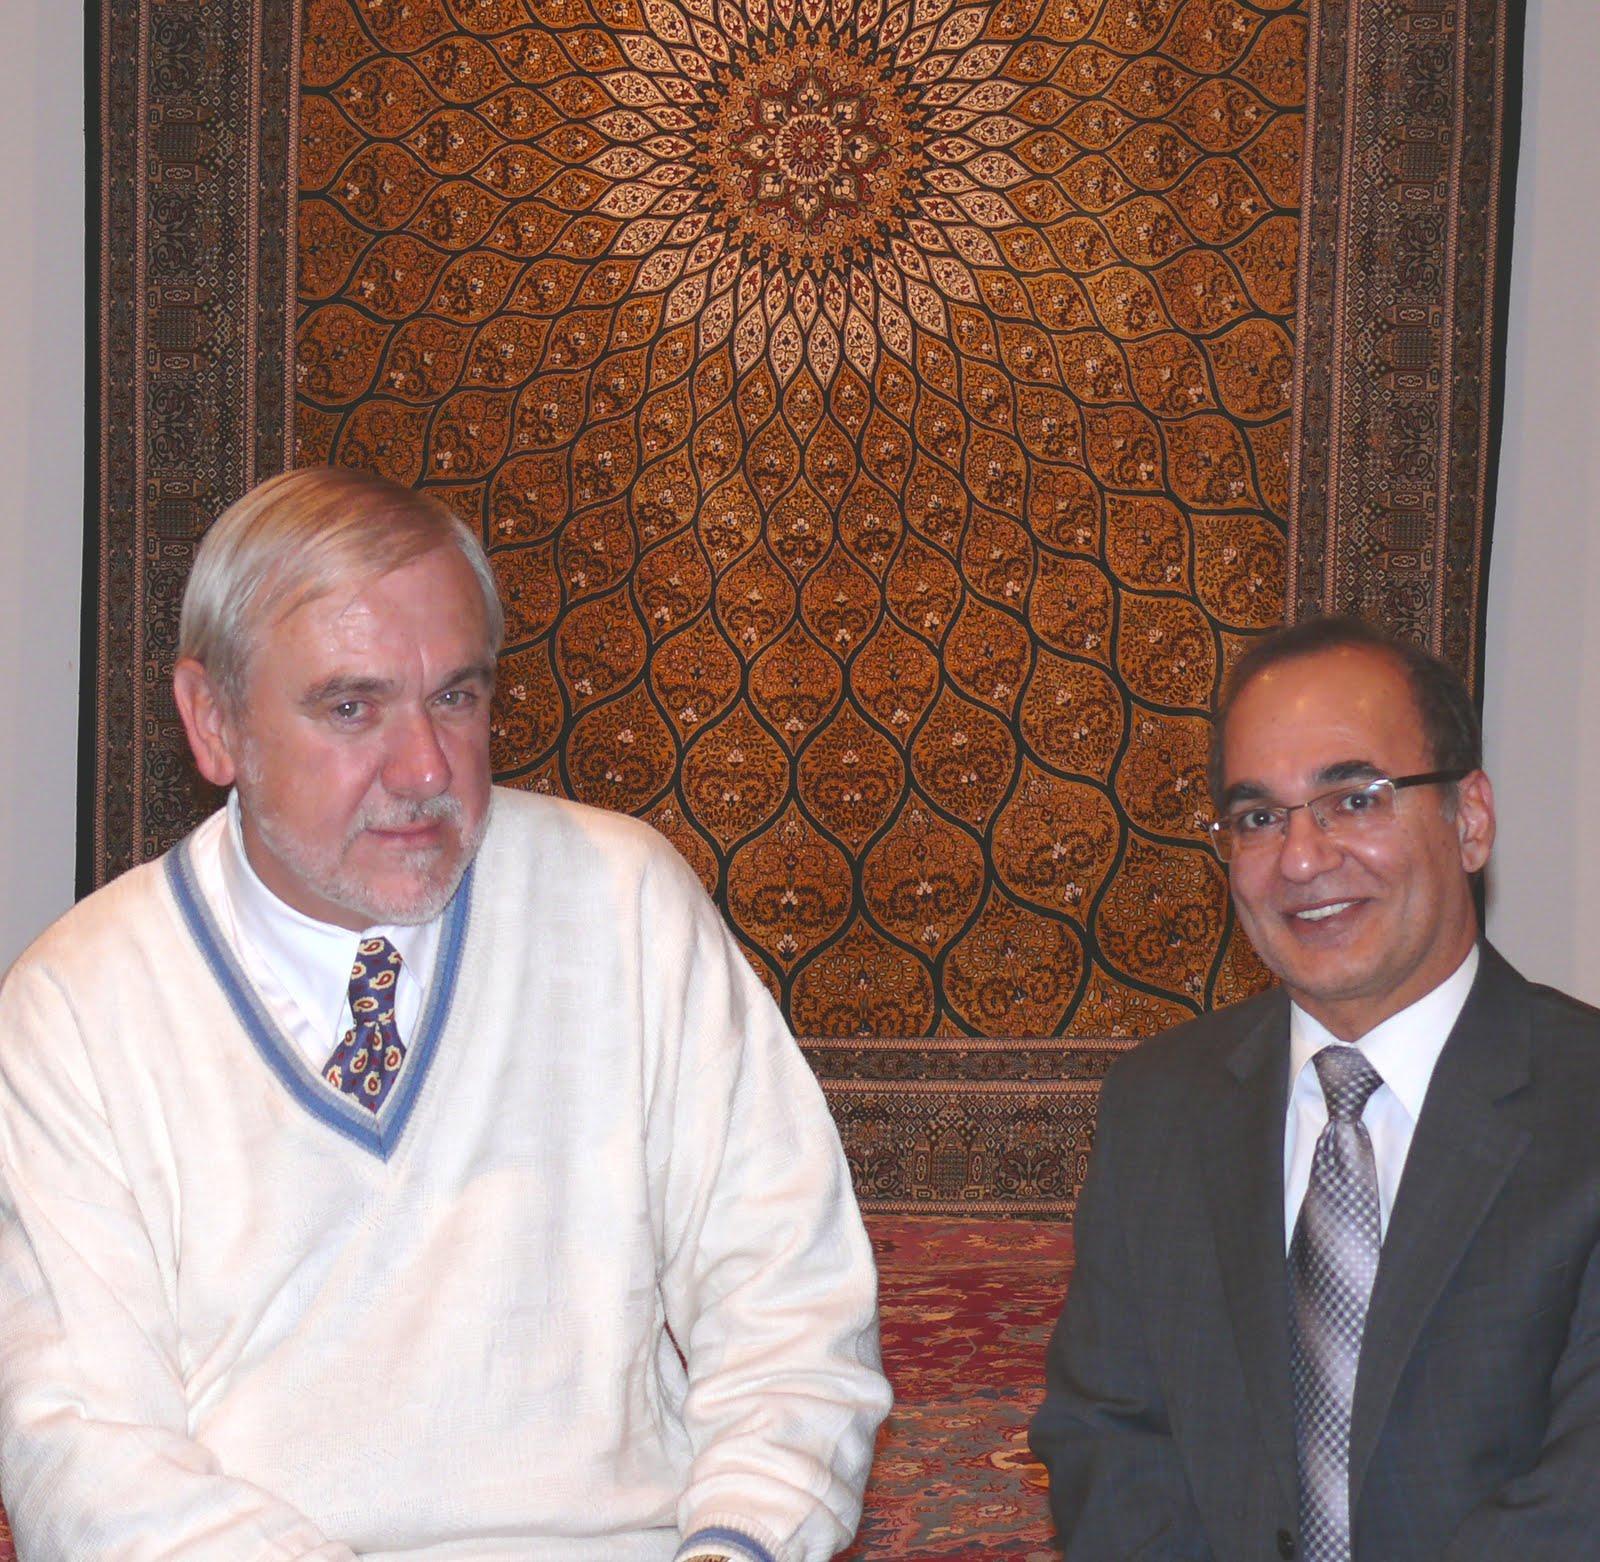 Dr James Turner And Mr Abbas Keshmiri Jpg